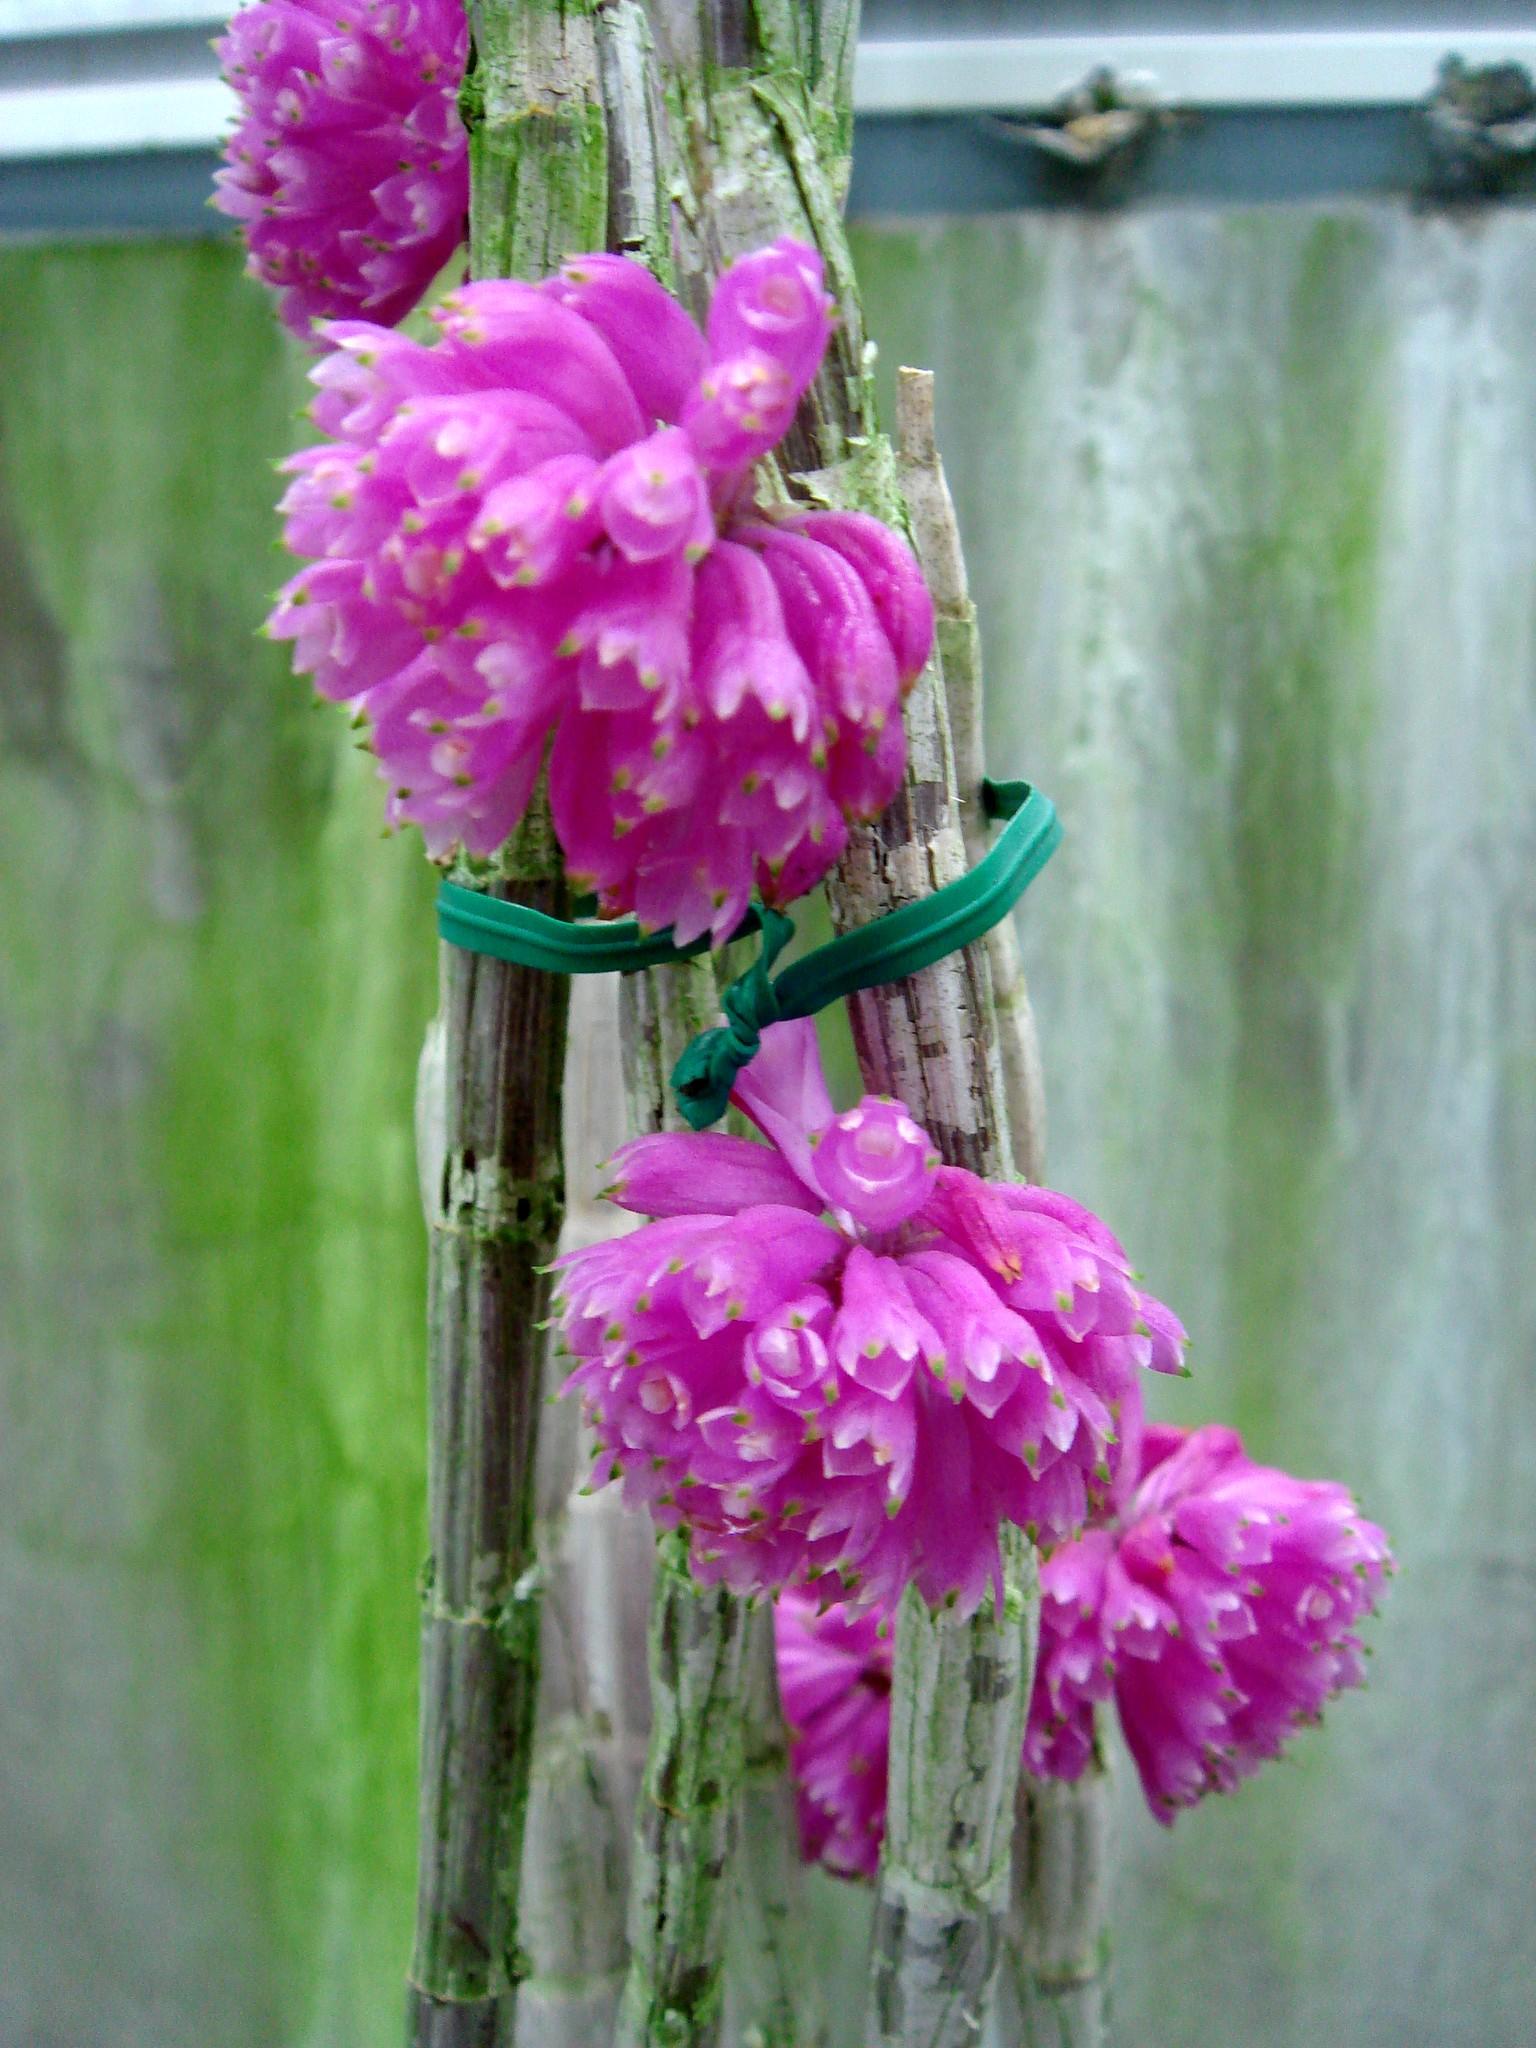 http://orchids.la.coocan.jp/Dendrobium/Dendrobium%20purpureum/DSC04385.JPG